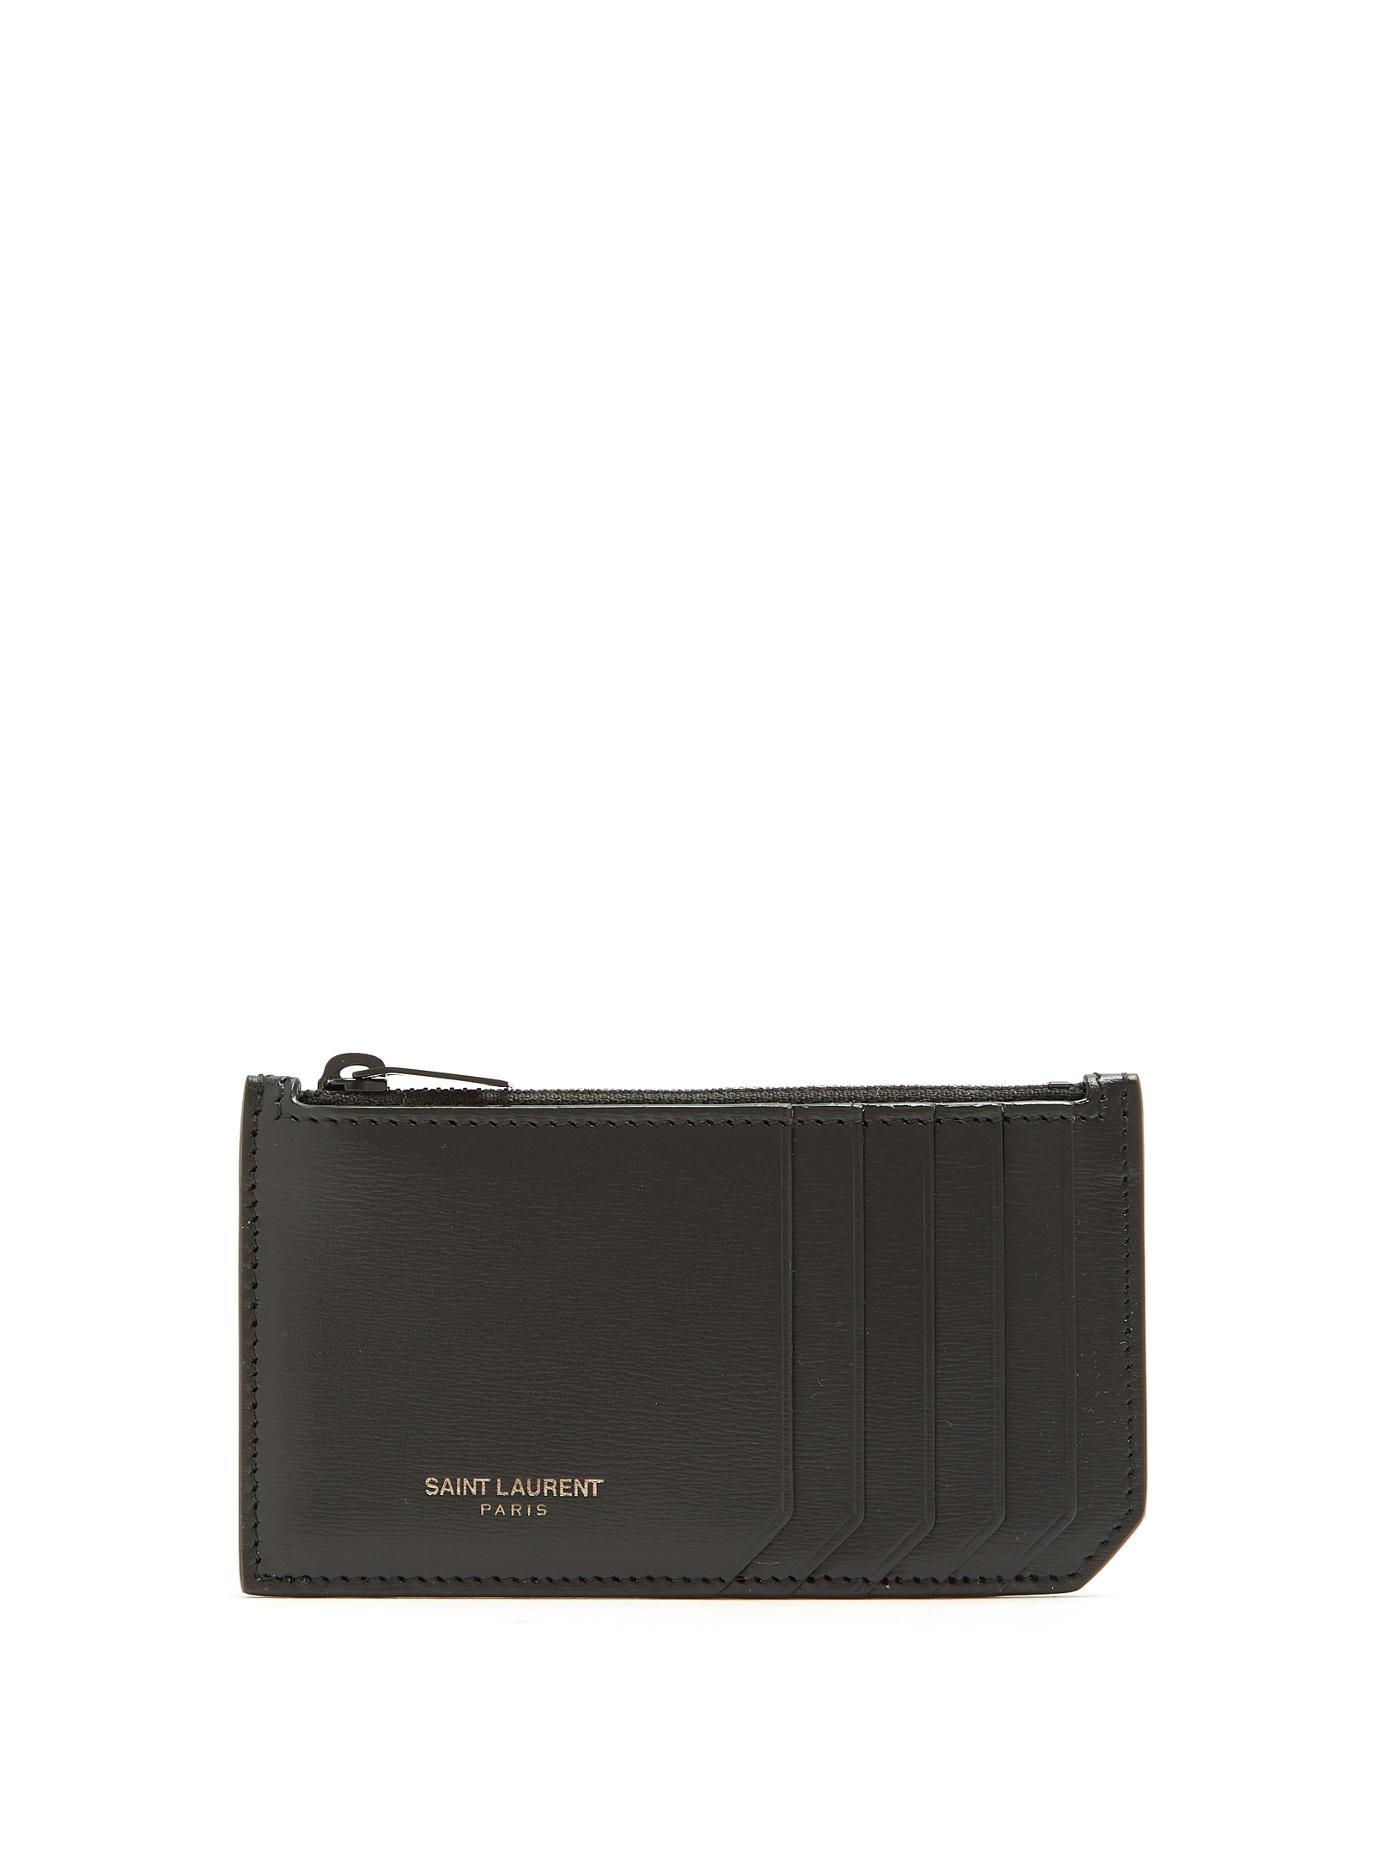 b4fca1c197 Fragment Leather Zip Card Holder in 1000 Black